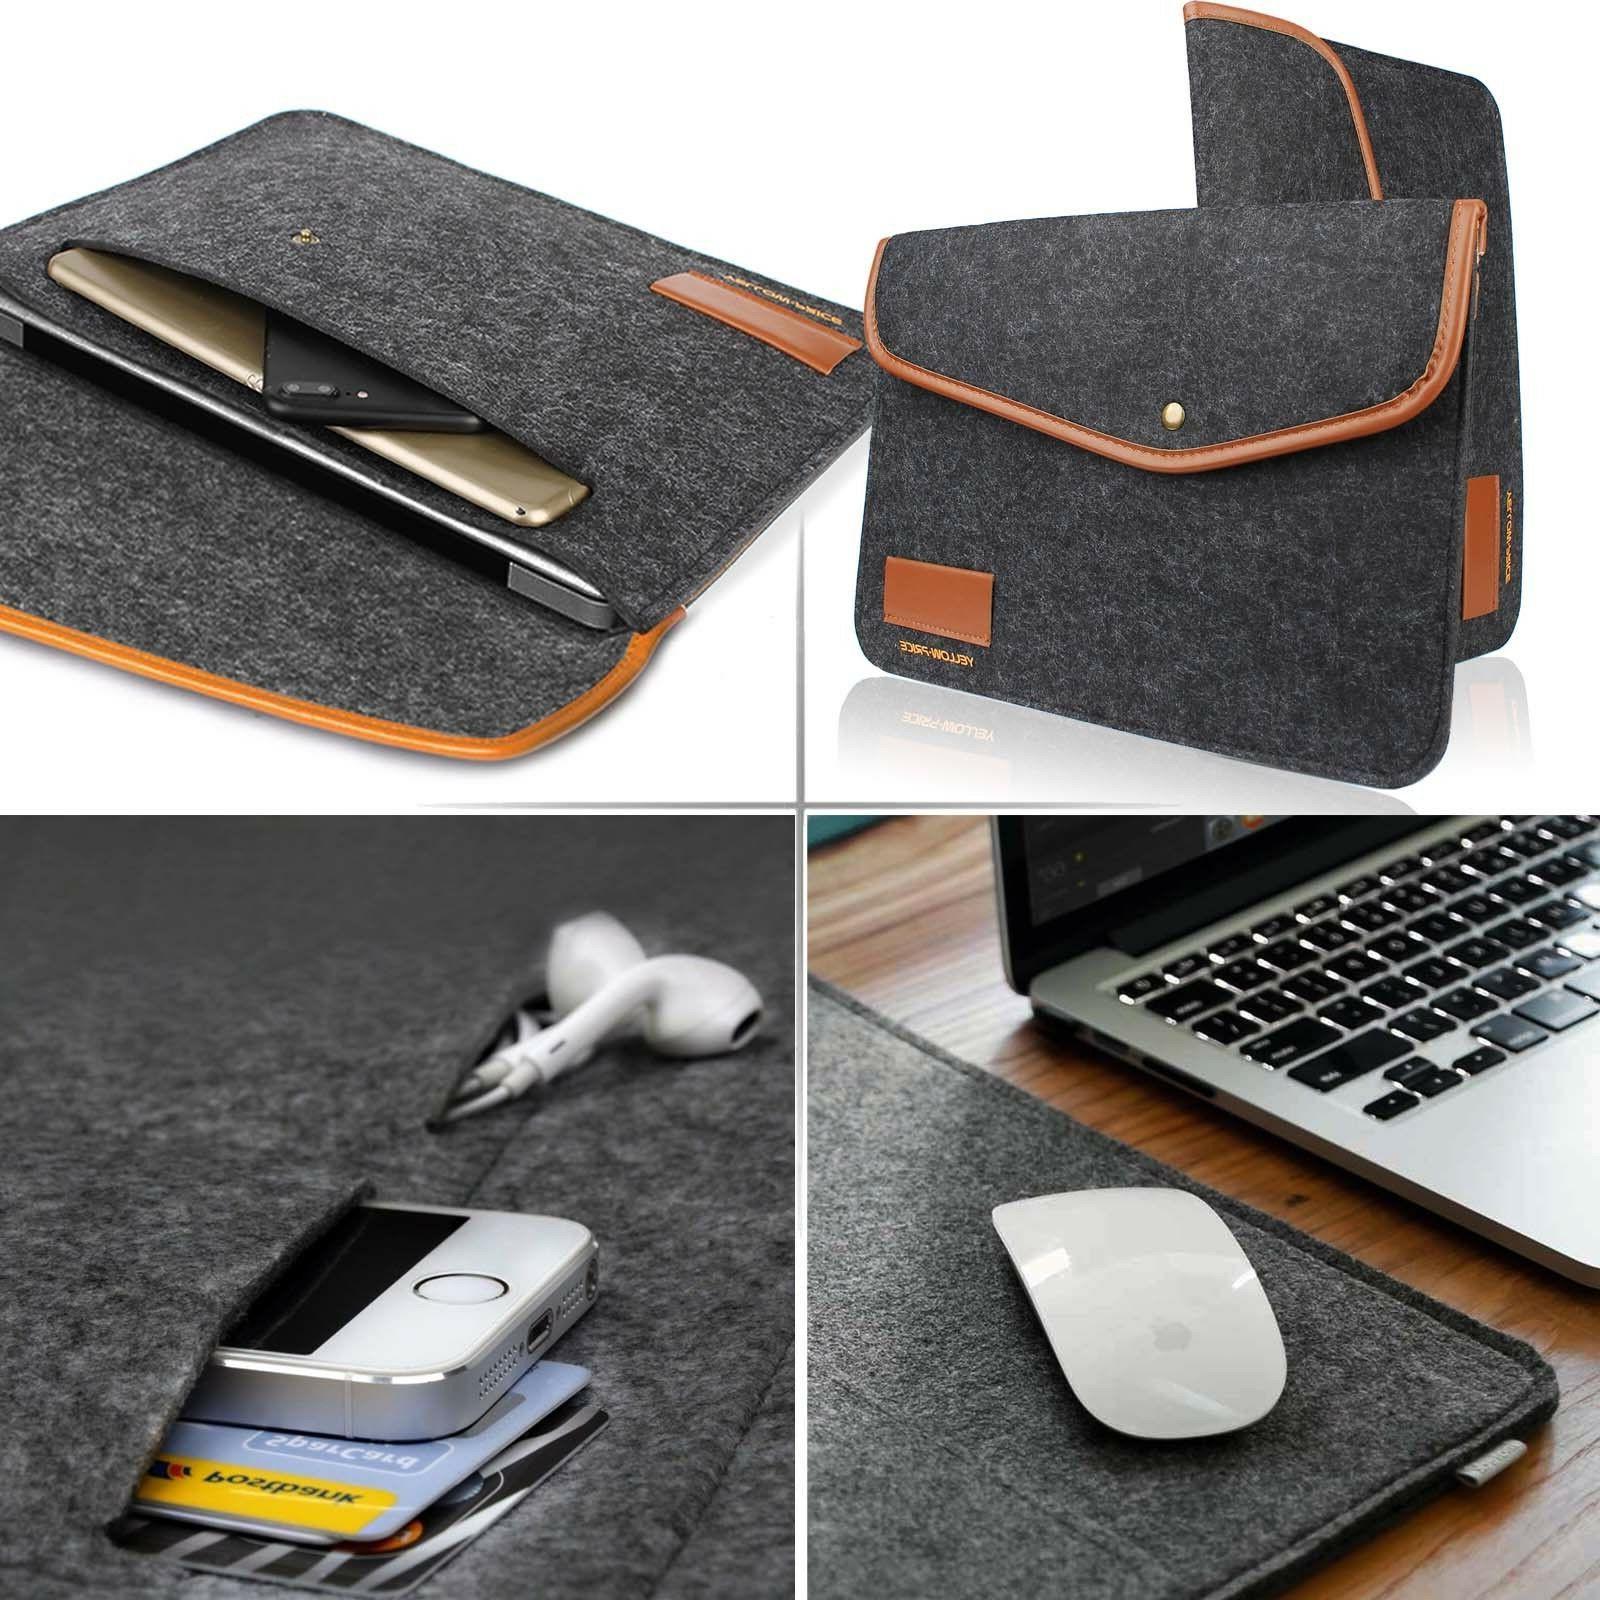 Felt Business Notebook Sleeve Case Laptop Bag For iPad 12.9/